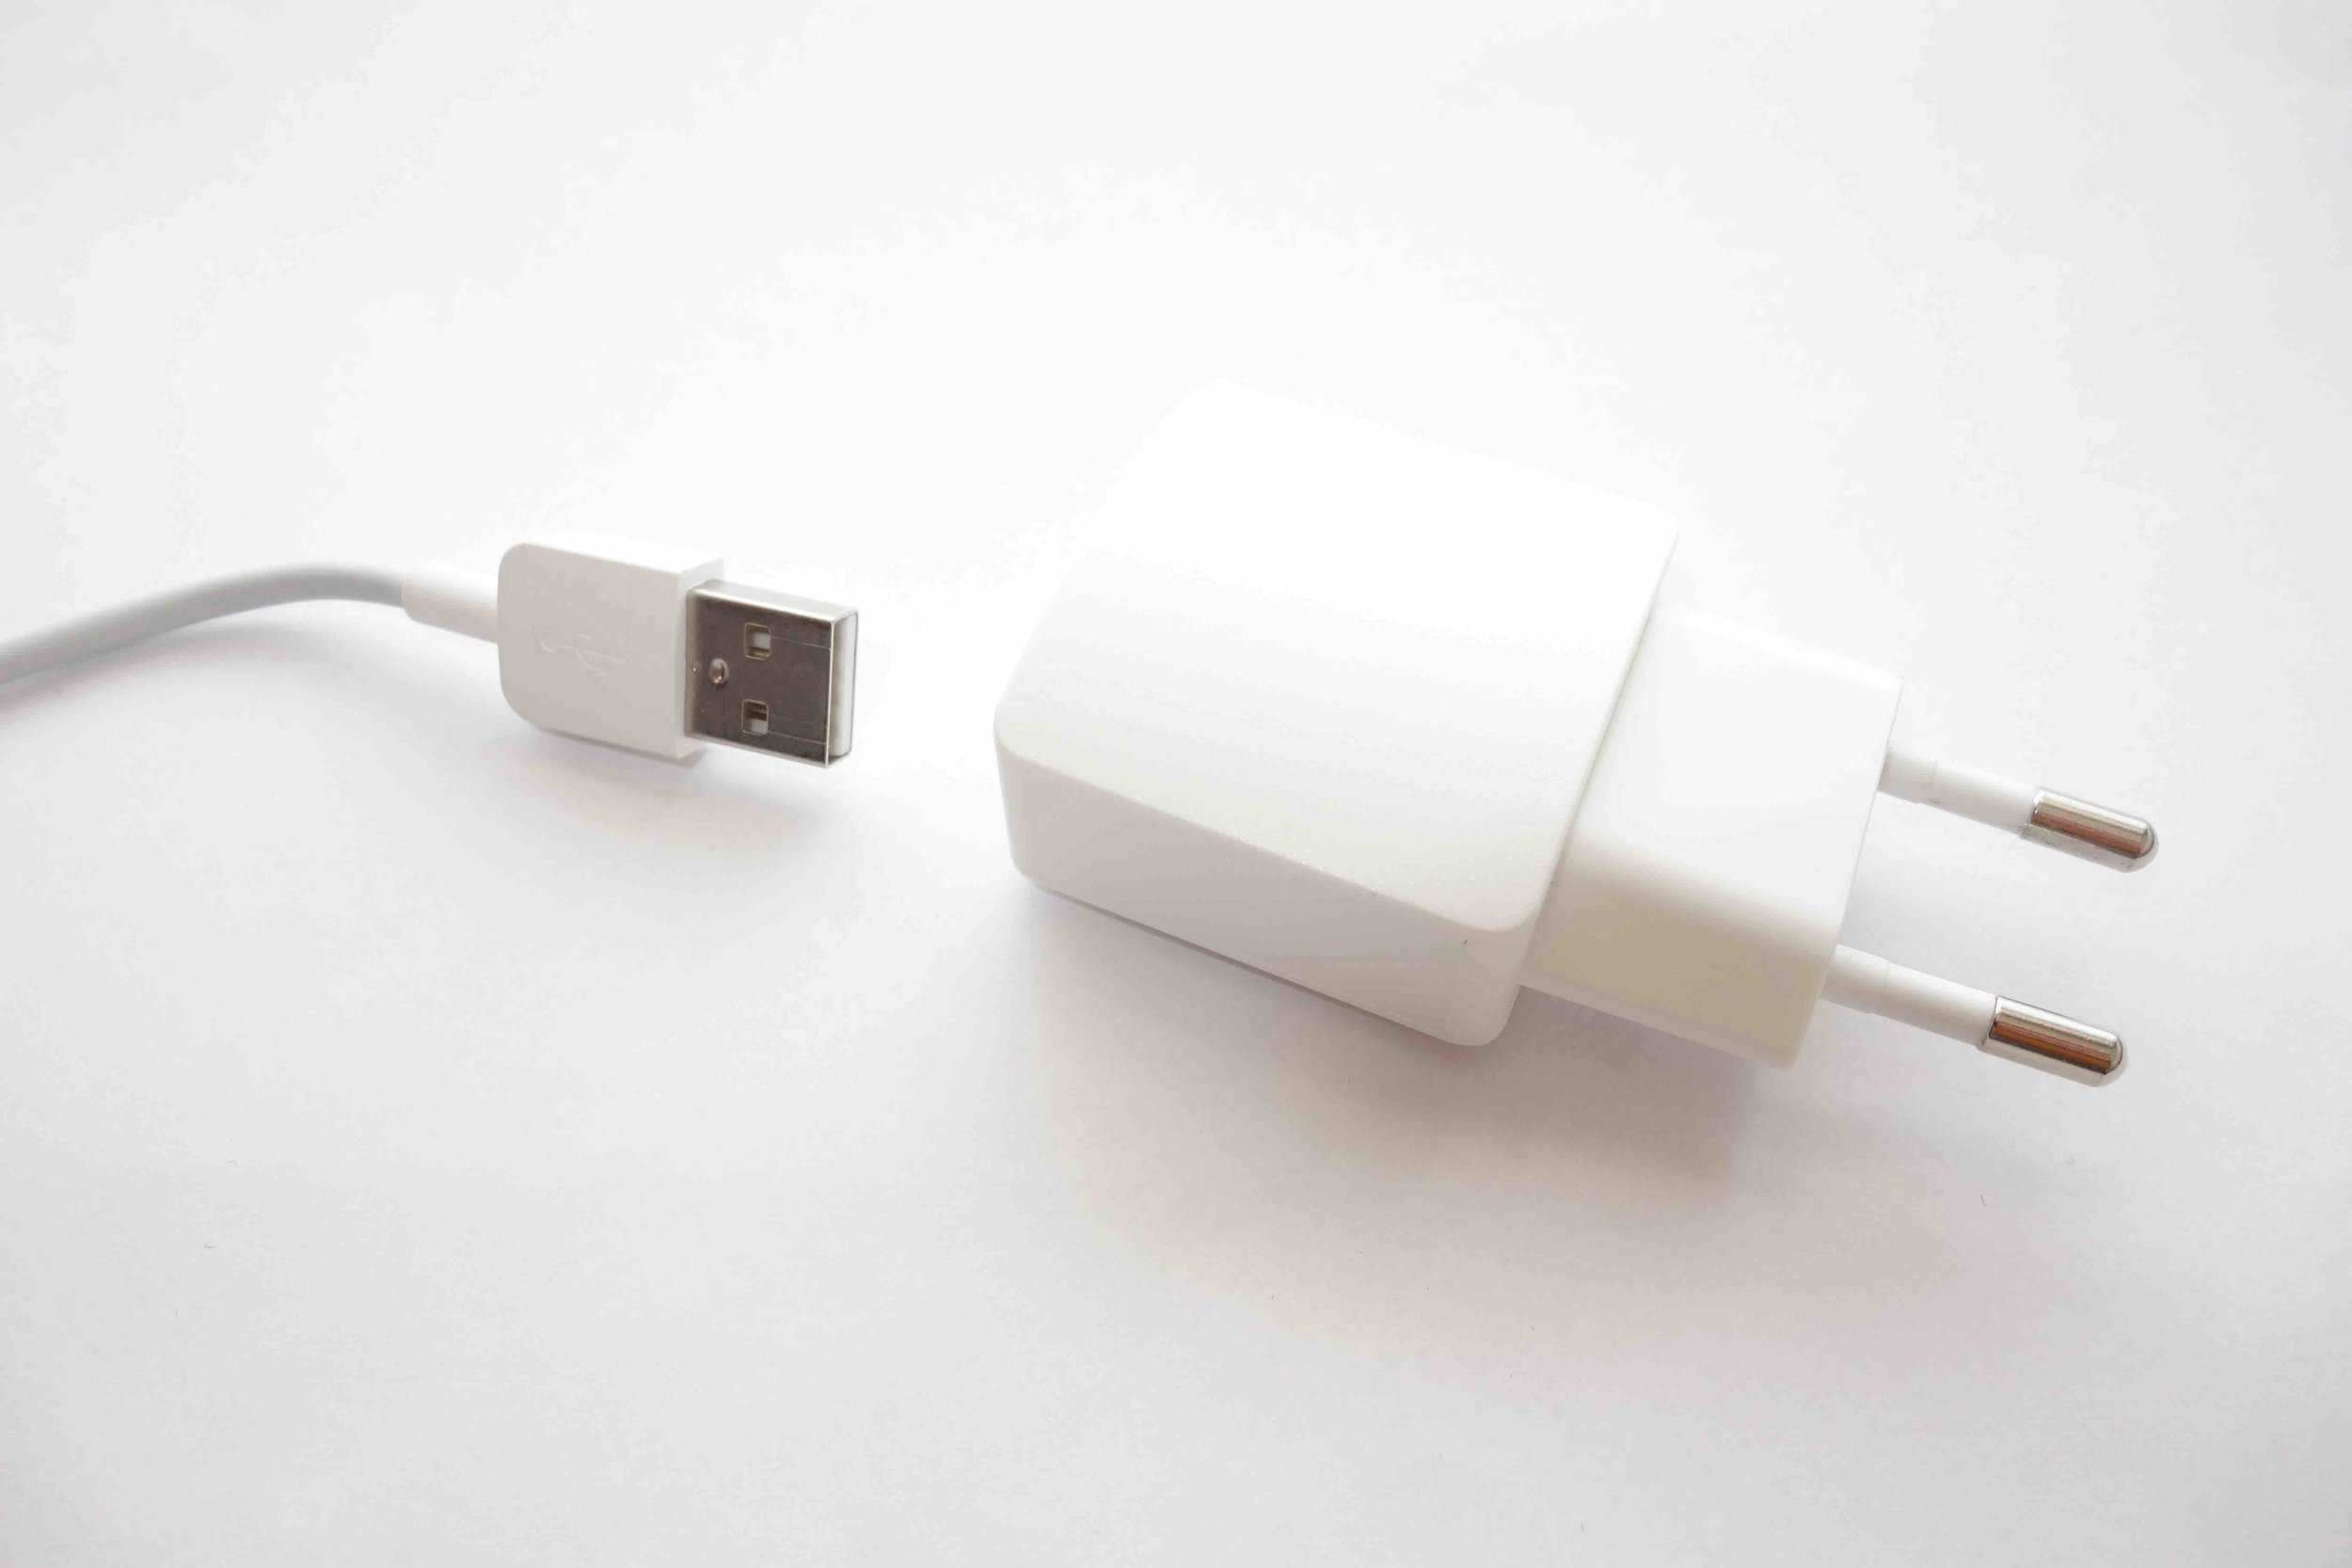 European 2 Prong Round USB adapter